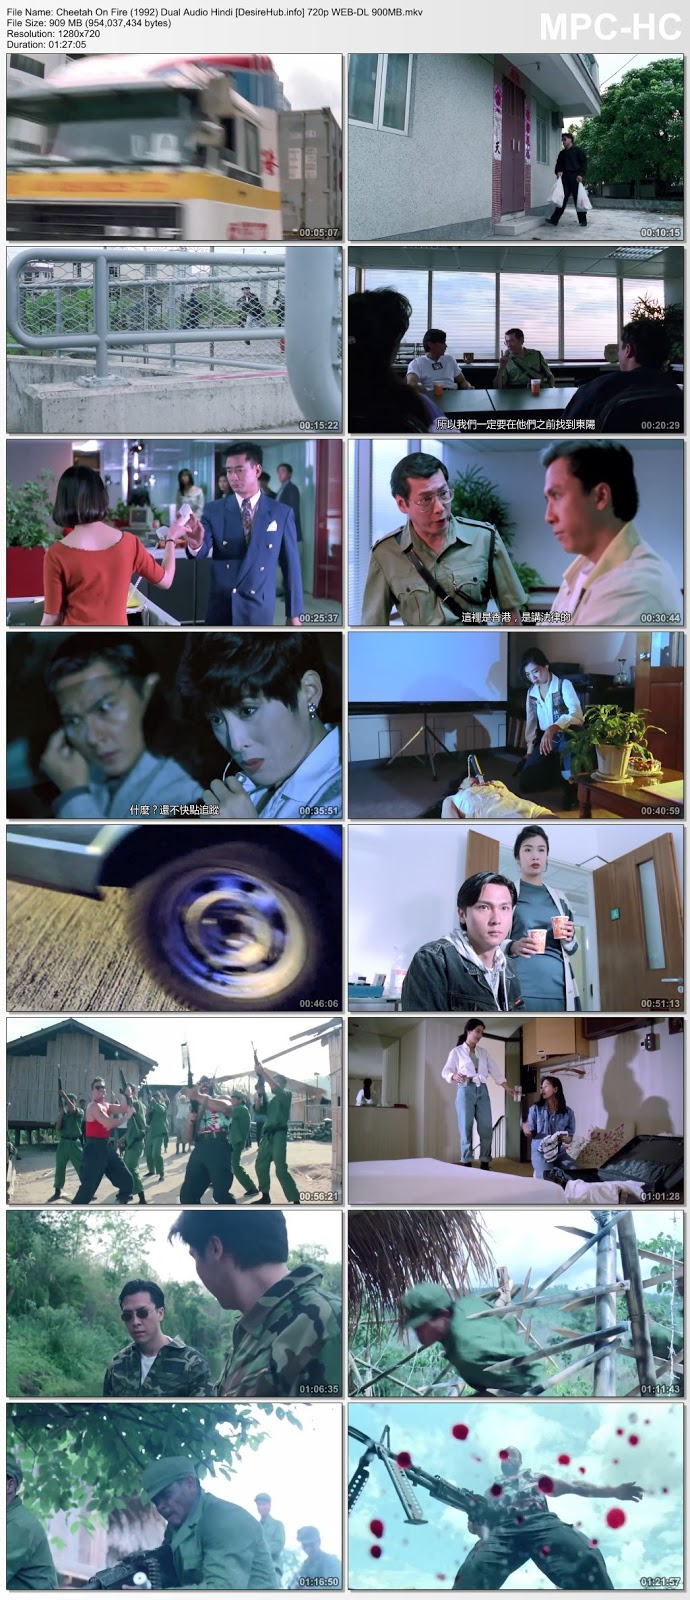 Cheetah On Fire (1992) UNRATED Dual Audio Hindi 720p WEB-DL 900MB Desirehub